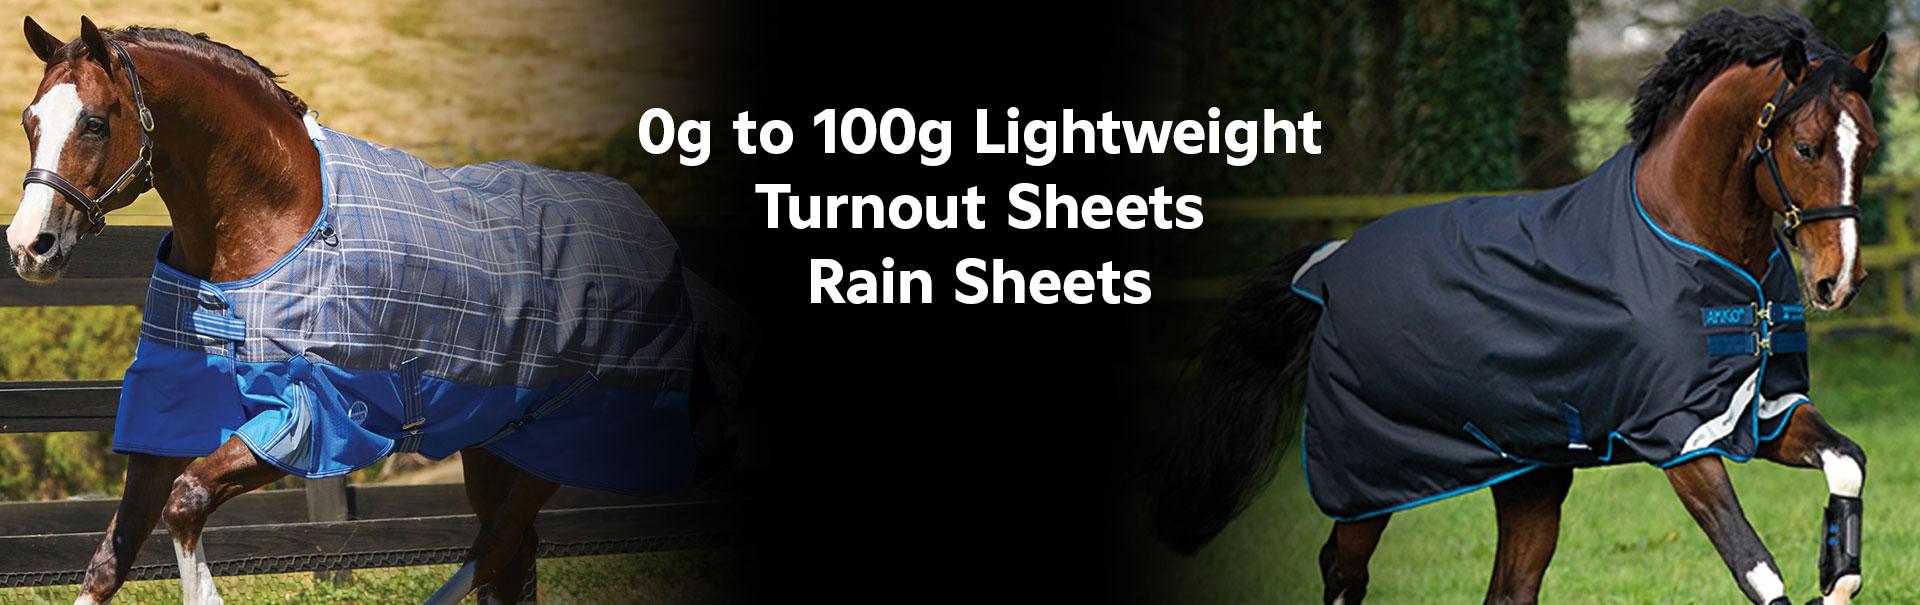 Turnout Sheets/Rain Sheets